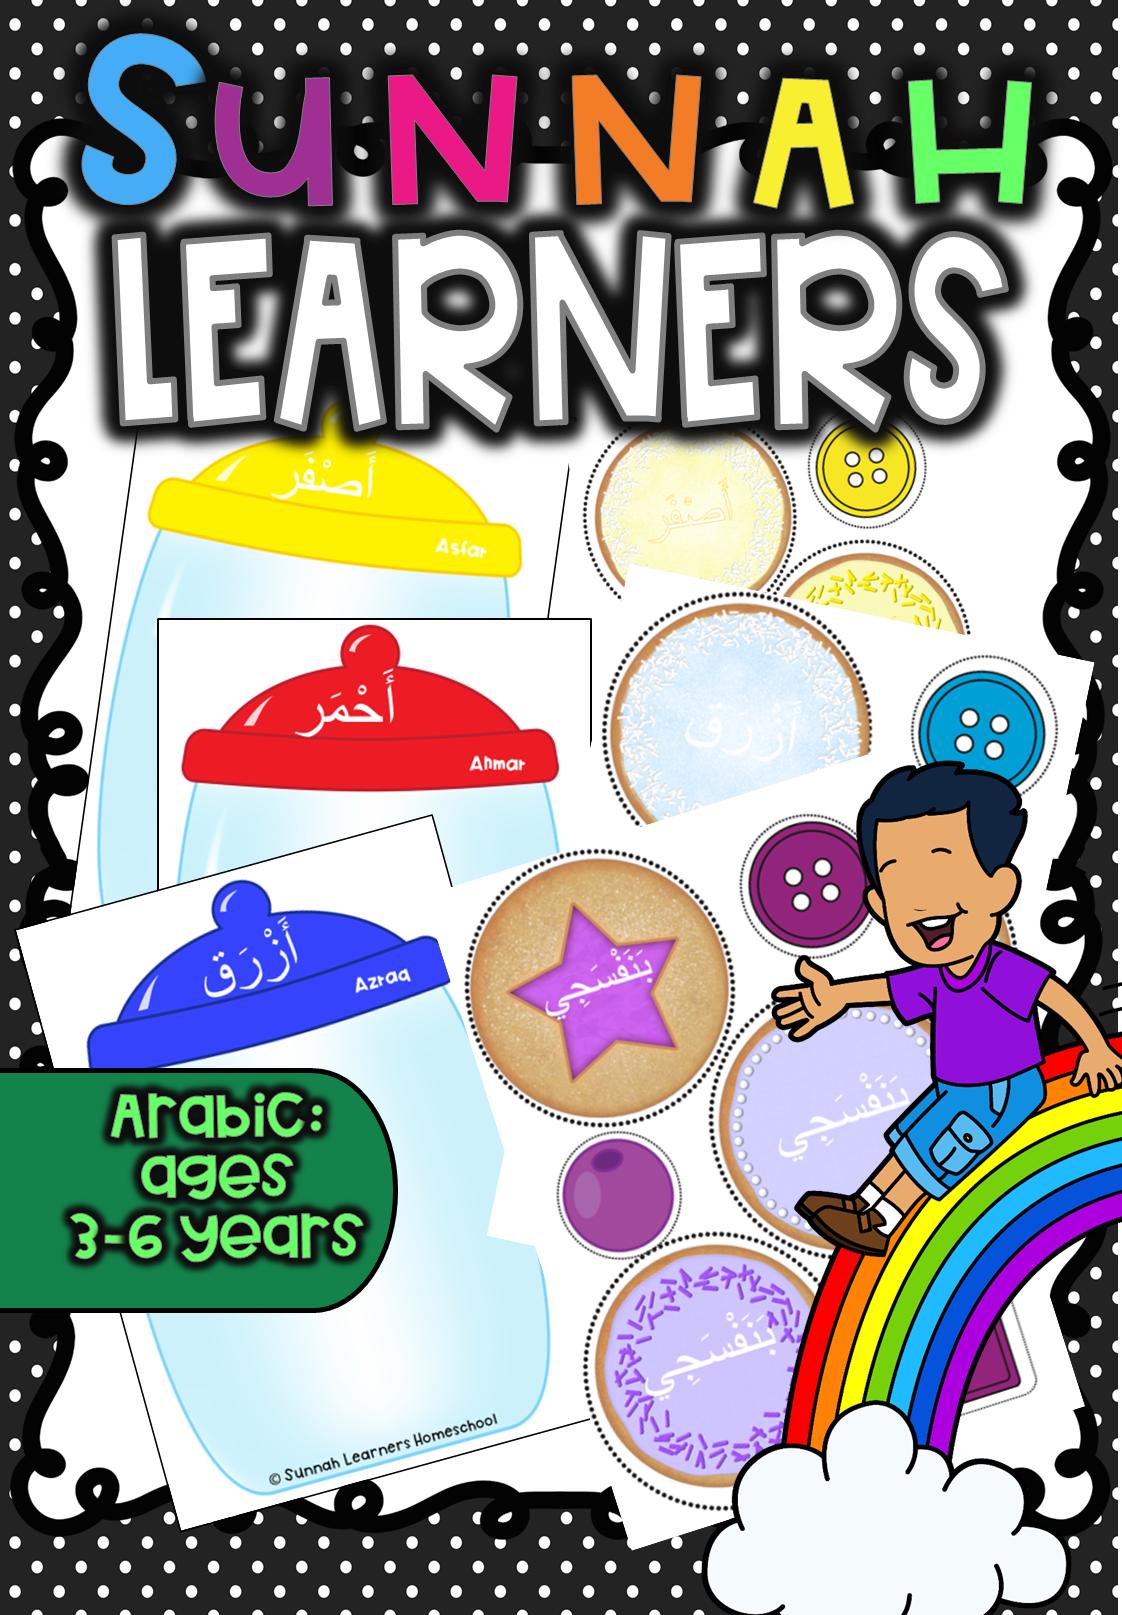 Cookie Jar Colors Arabic Sunnah Learners